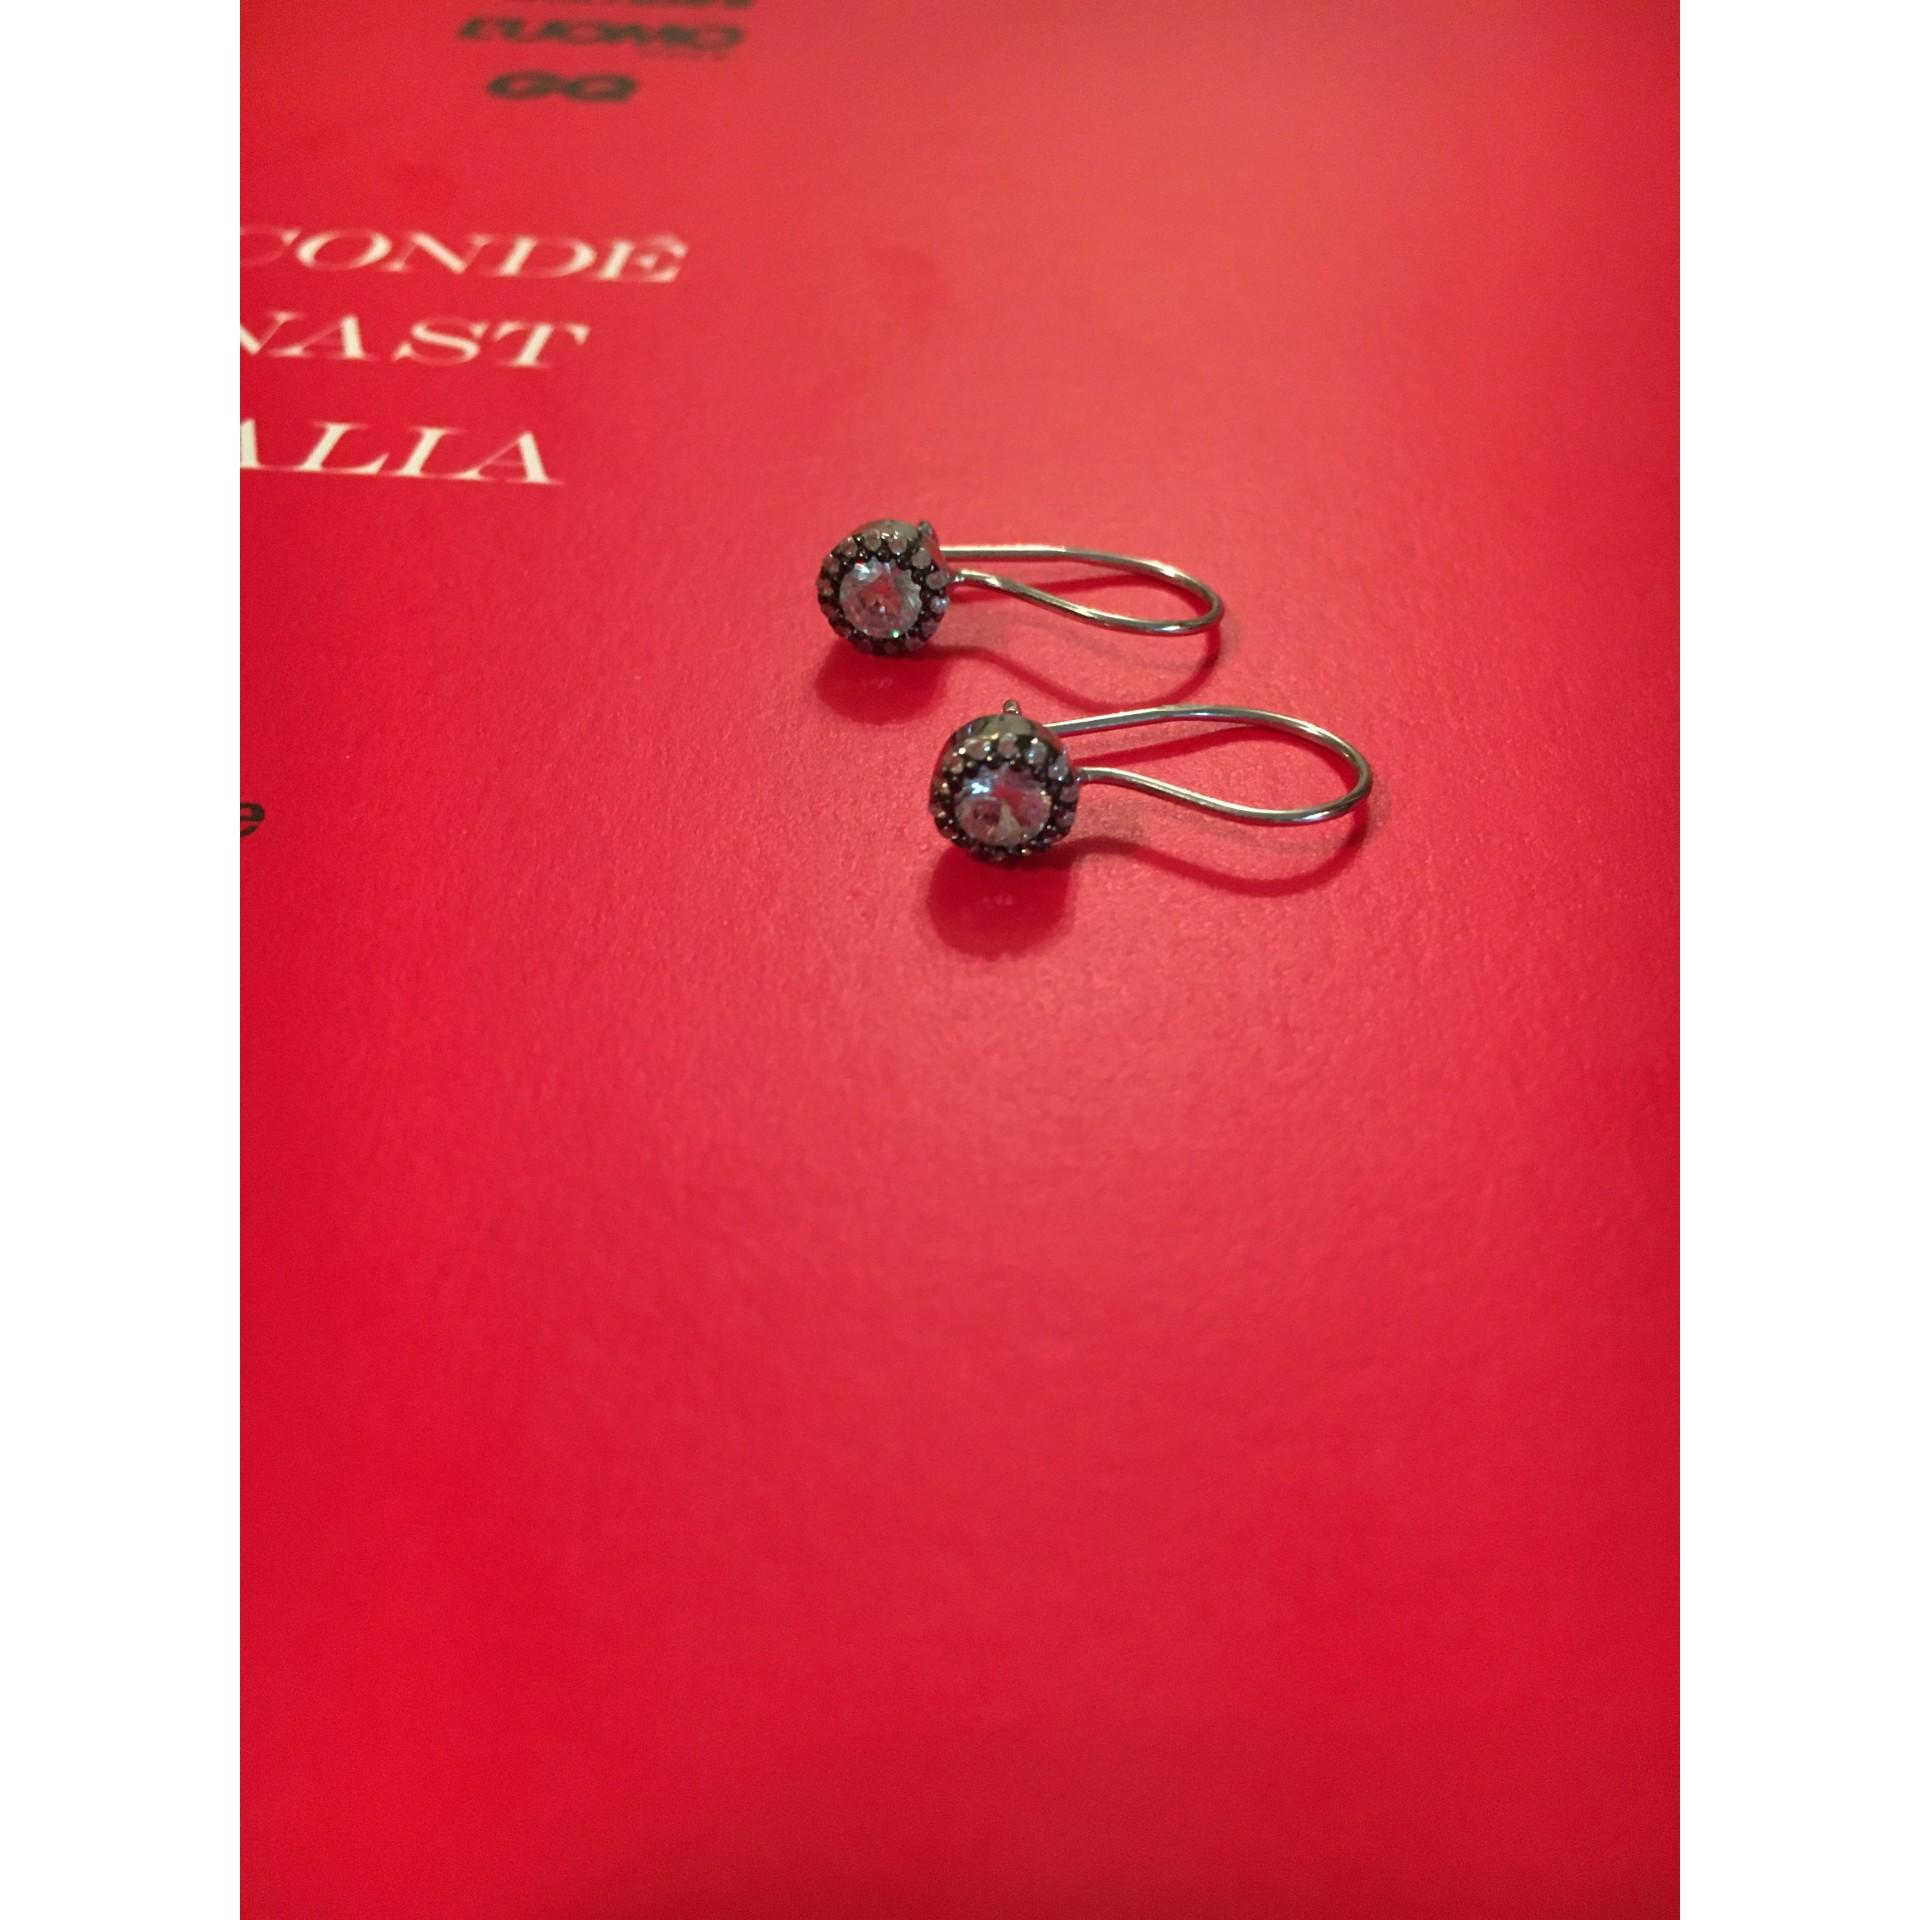 Morning Charm silver earrings